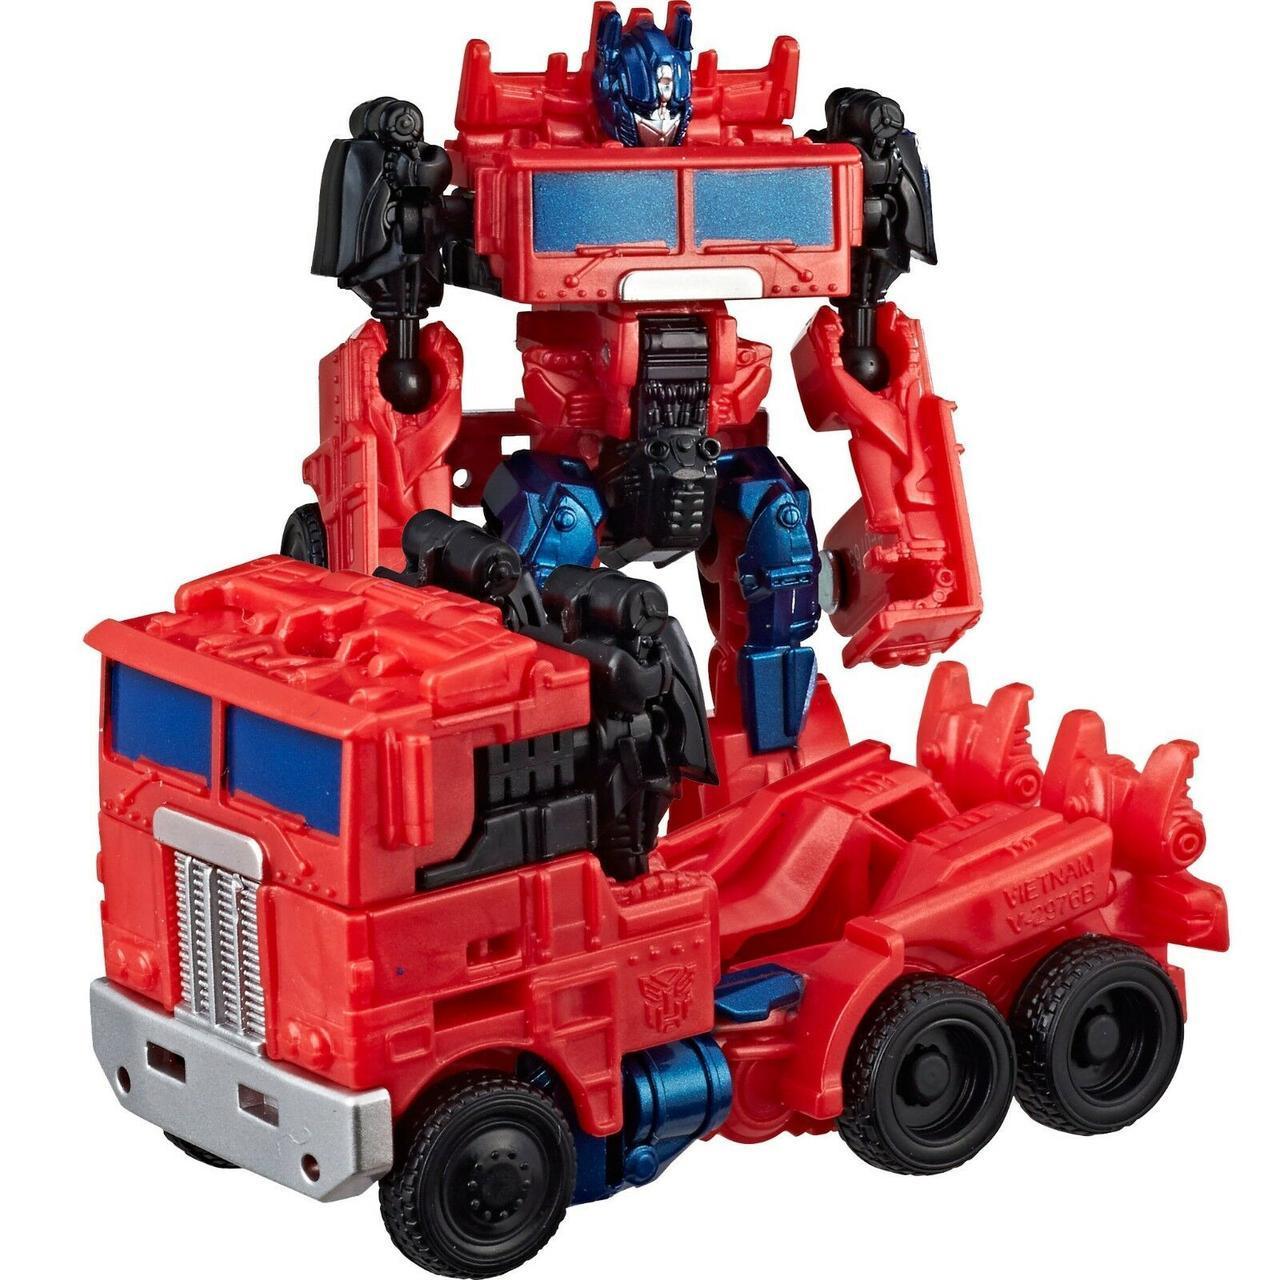 "Робот-трансформер, Оптимус Прайм, фильм ""Бамблби"" - Hasbro, ""Transformers Bumblebee"" Optimus Prime"